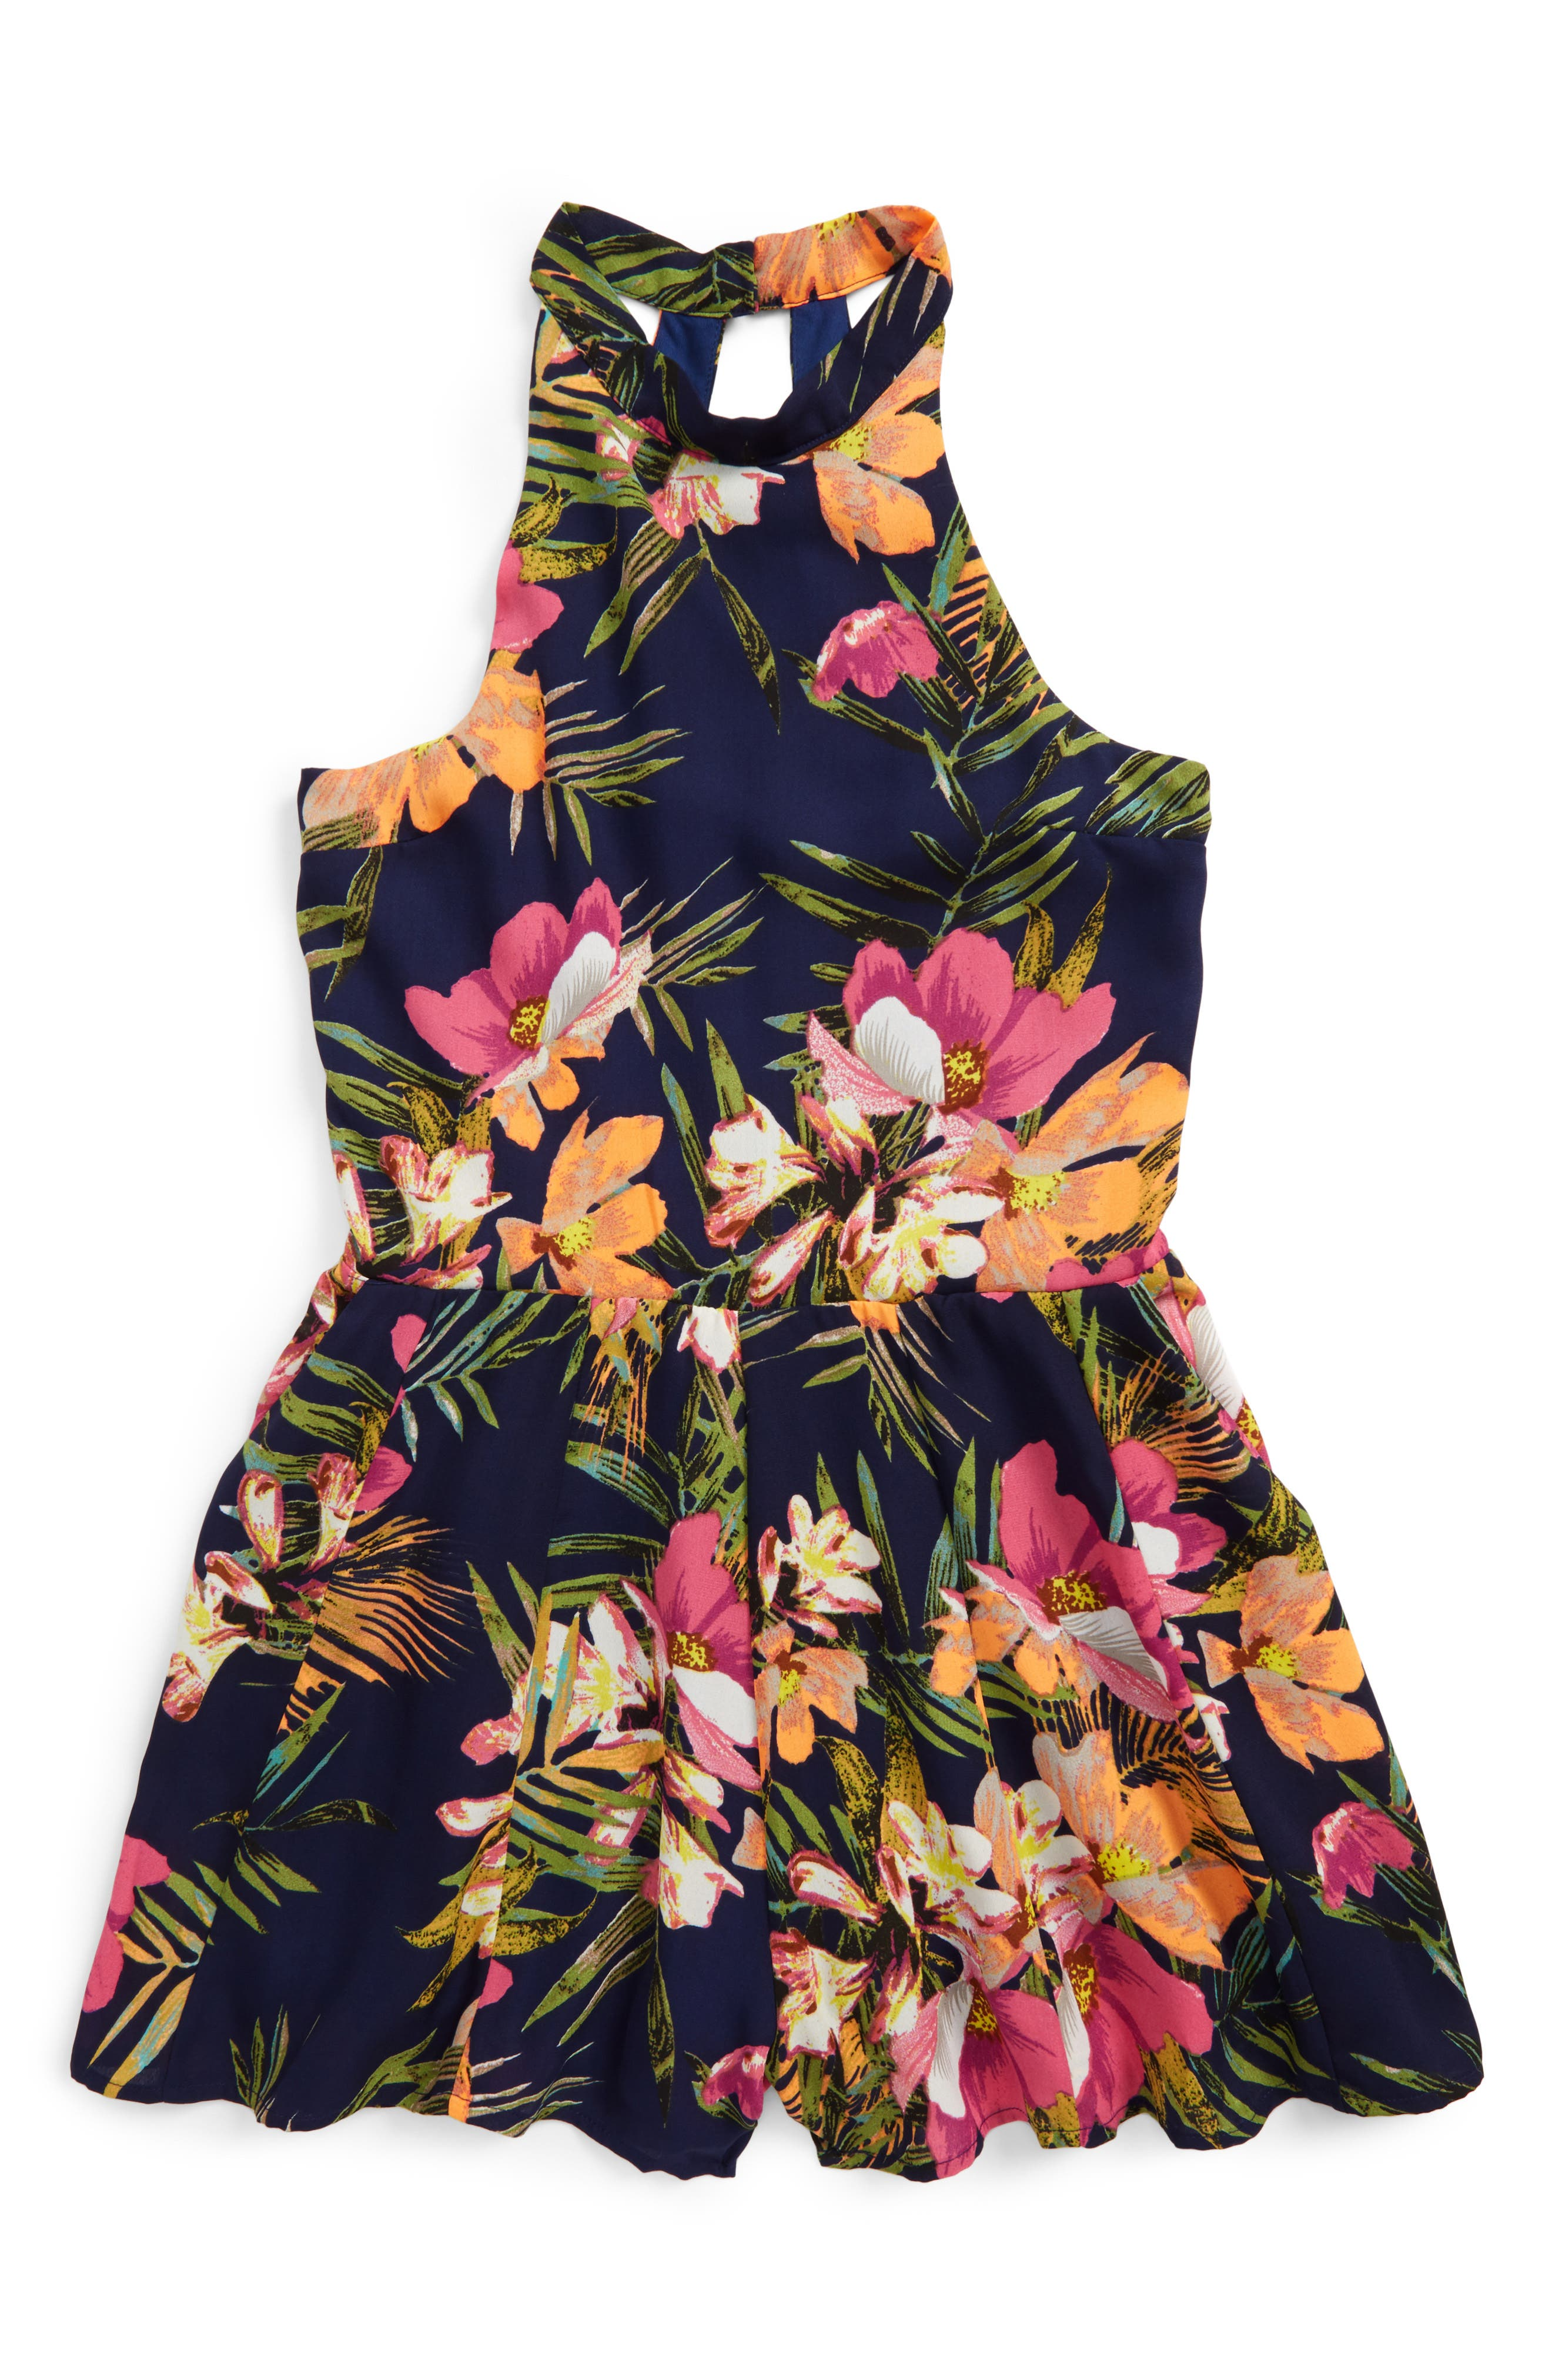 Miss Behave Safira Tropical Print Romper (Big Girls)